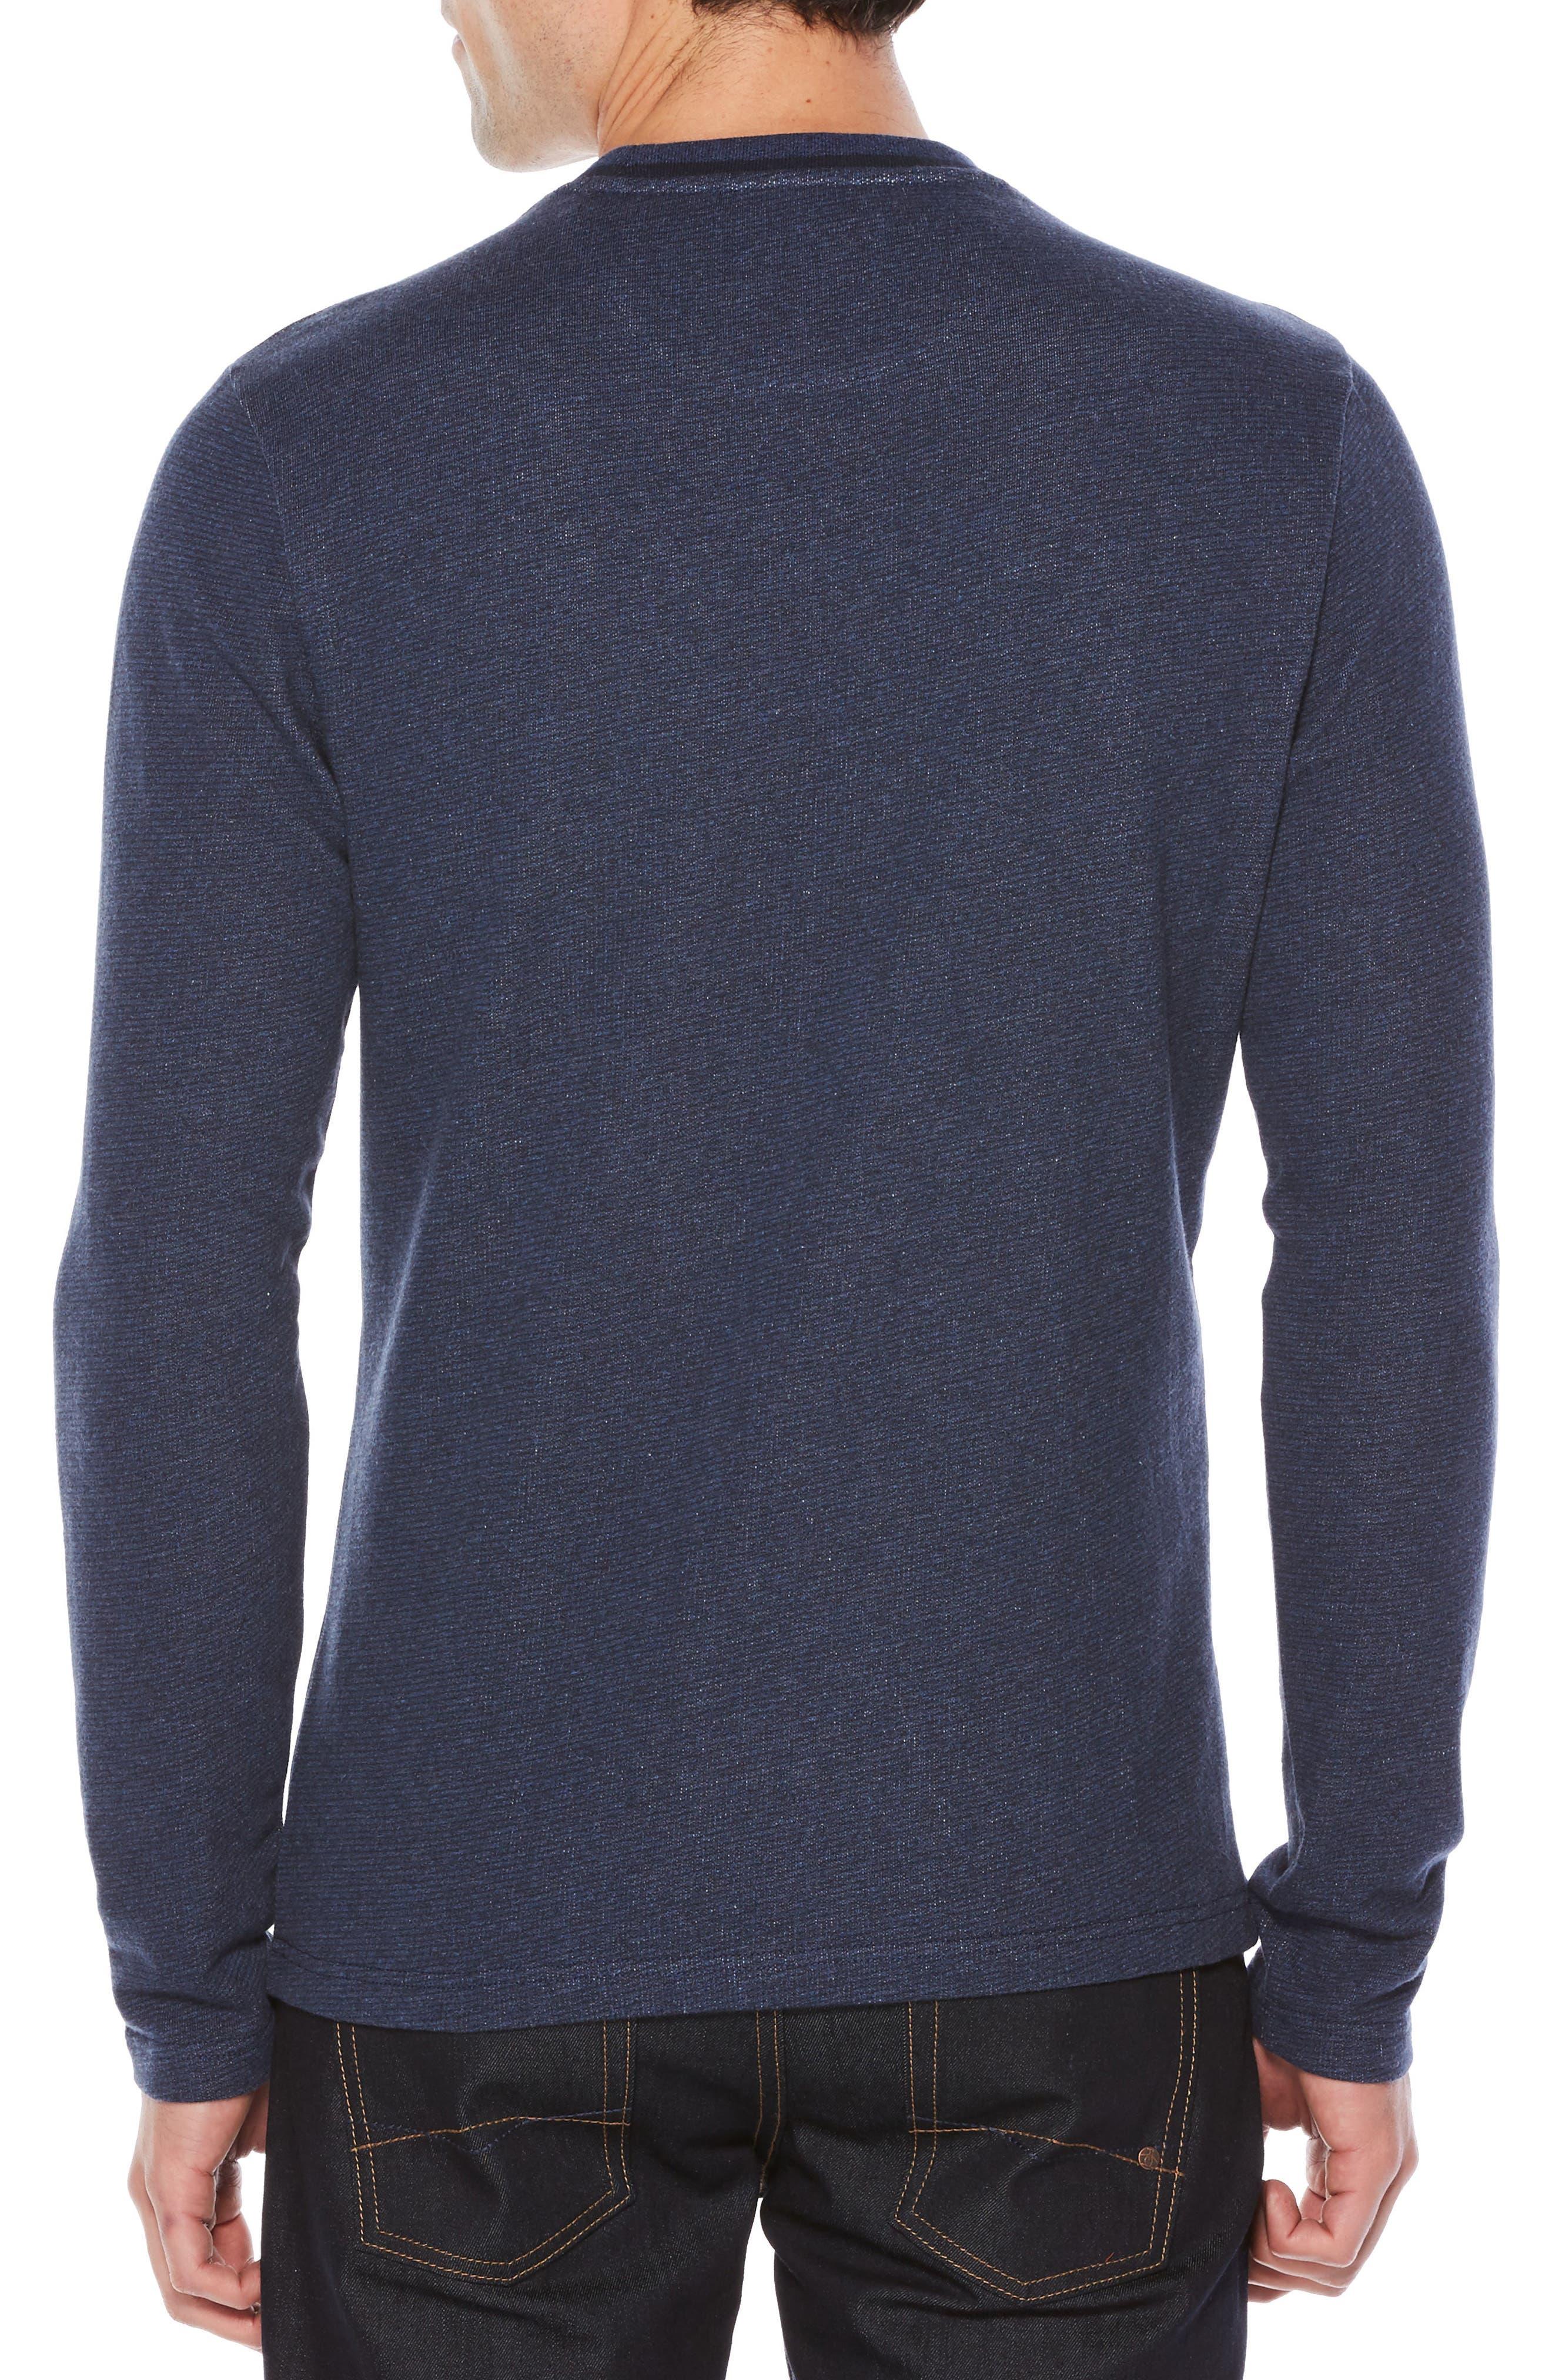 Alternate Image 2  - Original Penguin Jaspé Terry Long Sleeve T-Shirt